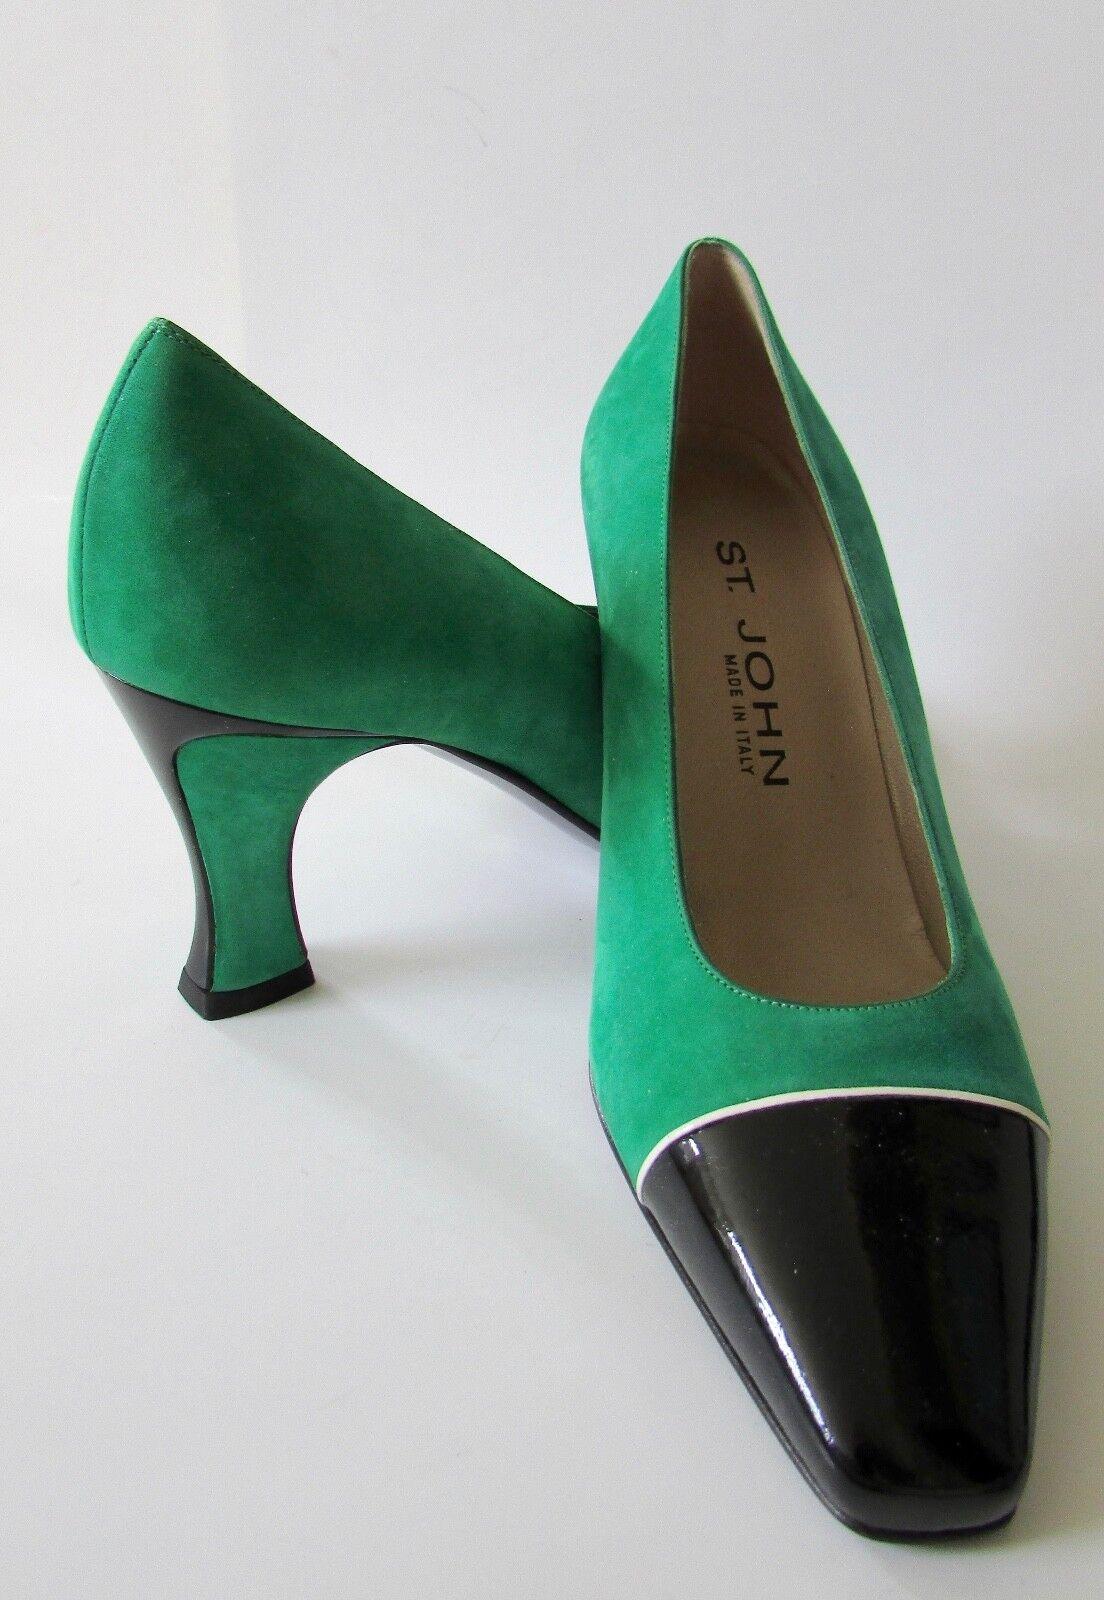 Nuevo St. John Italia bombas de puntera puntera puntera de patentes ante verde Talla 6.5  marcas de moda